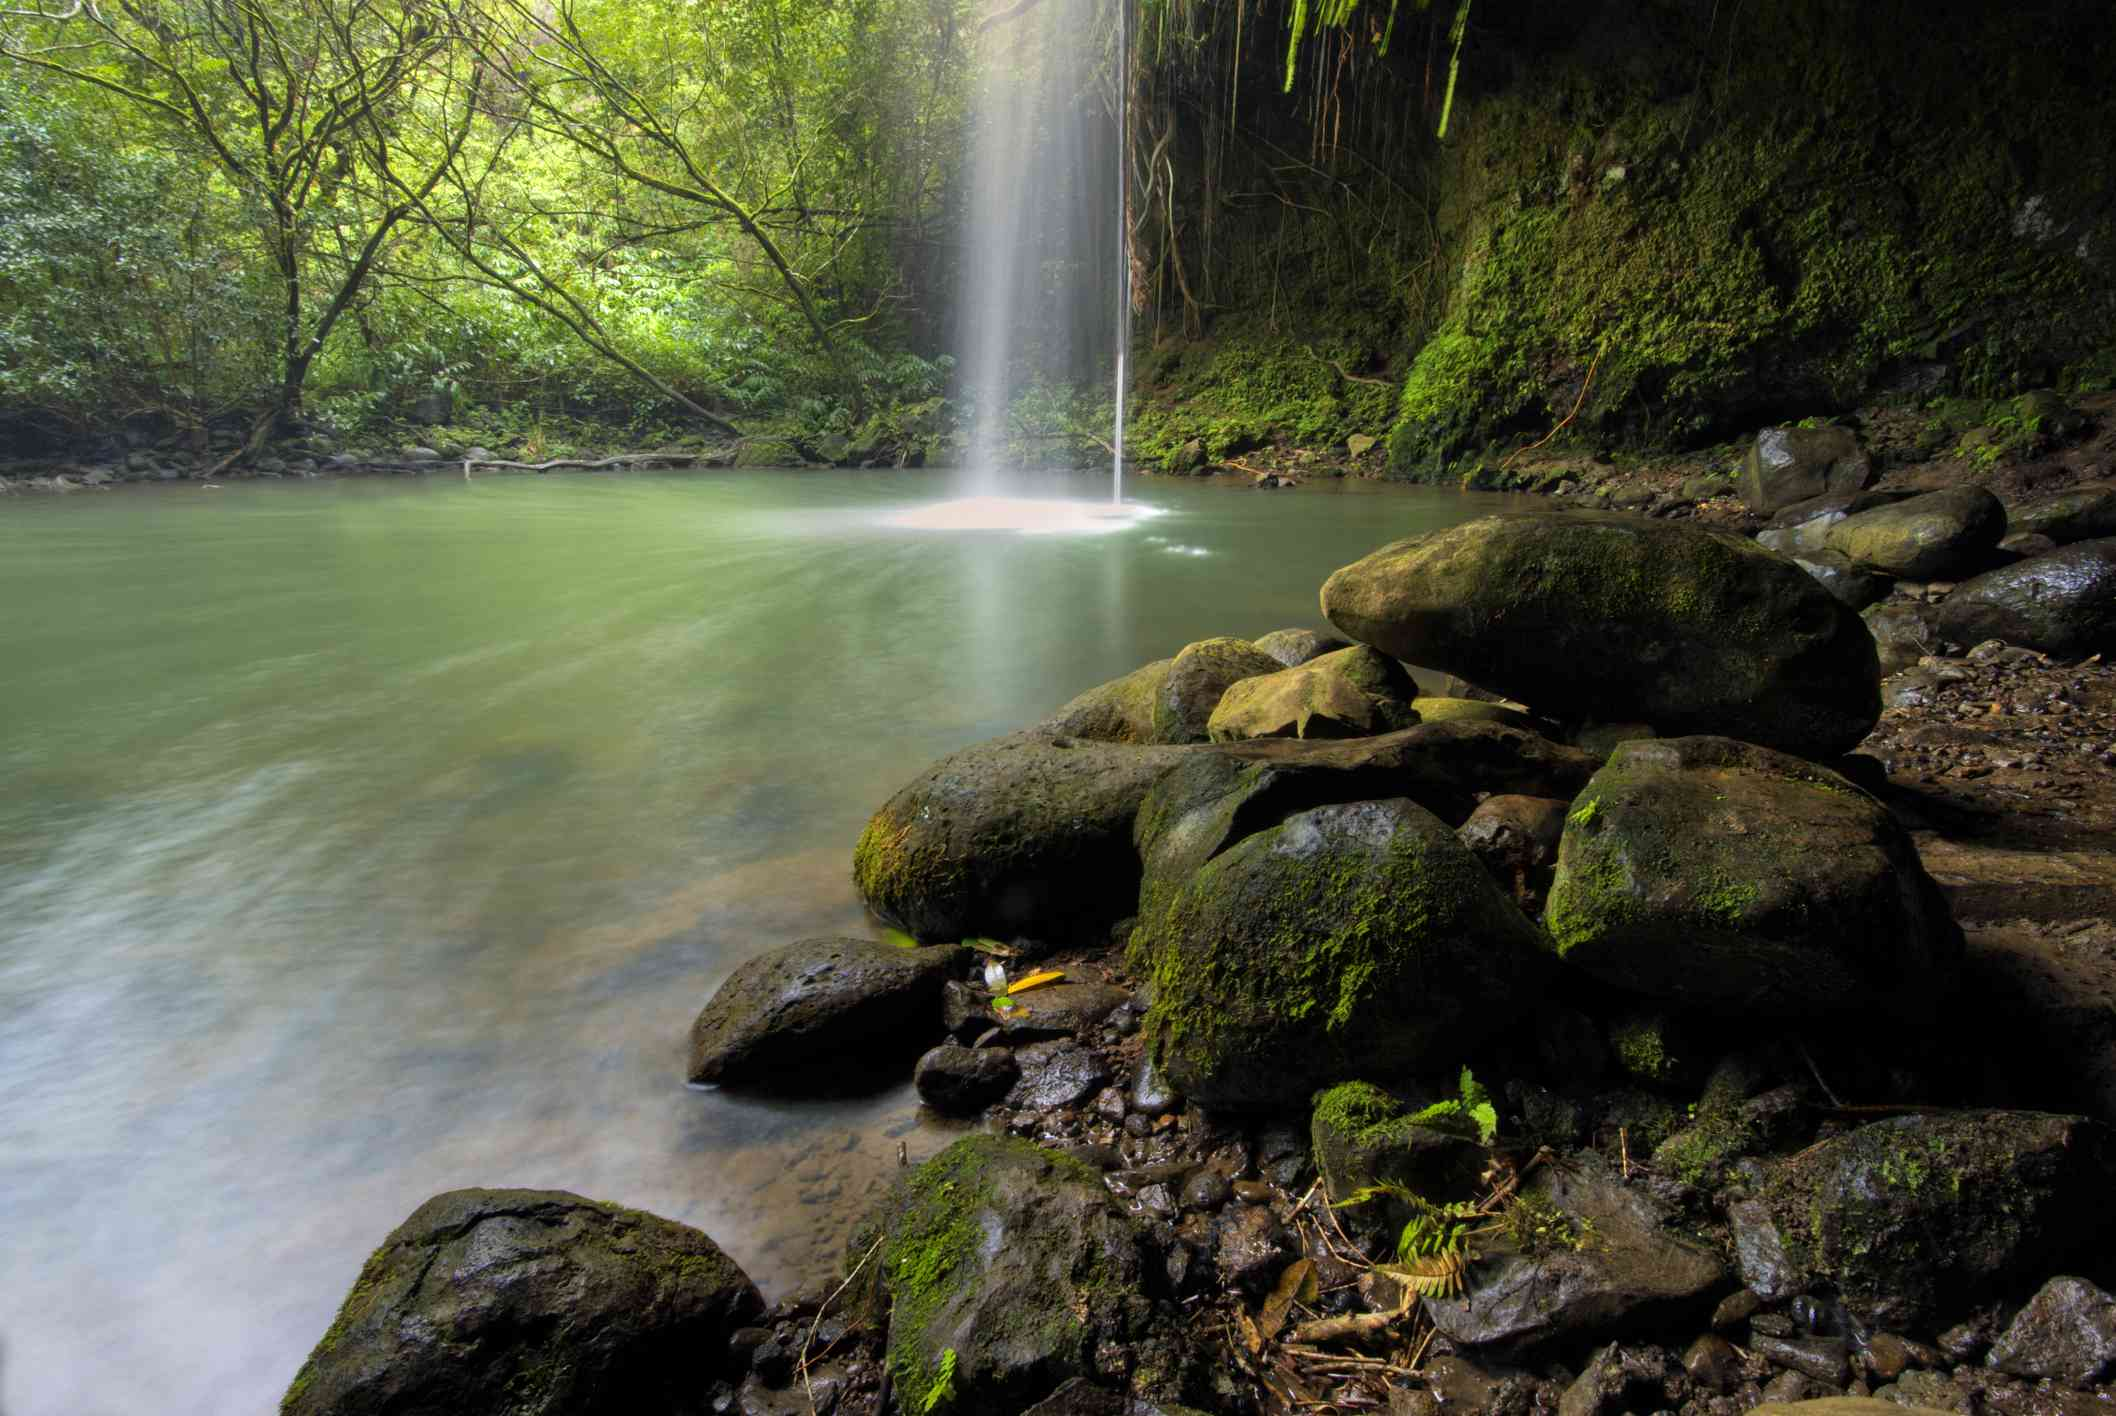 Twin Falls off of the Road to Hana on Maui